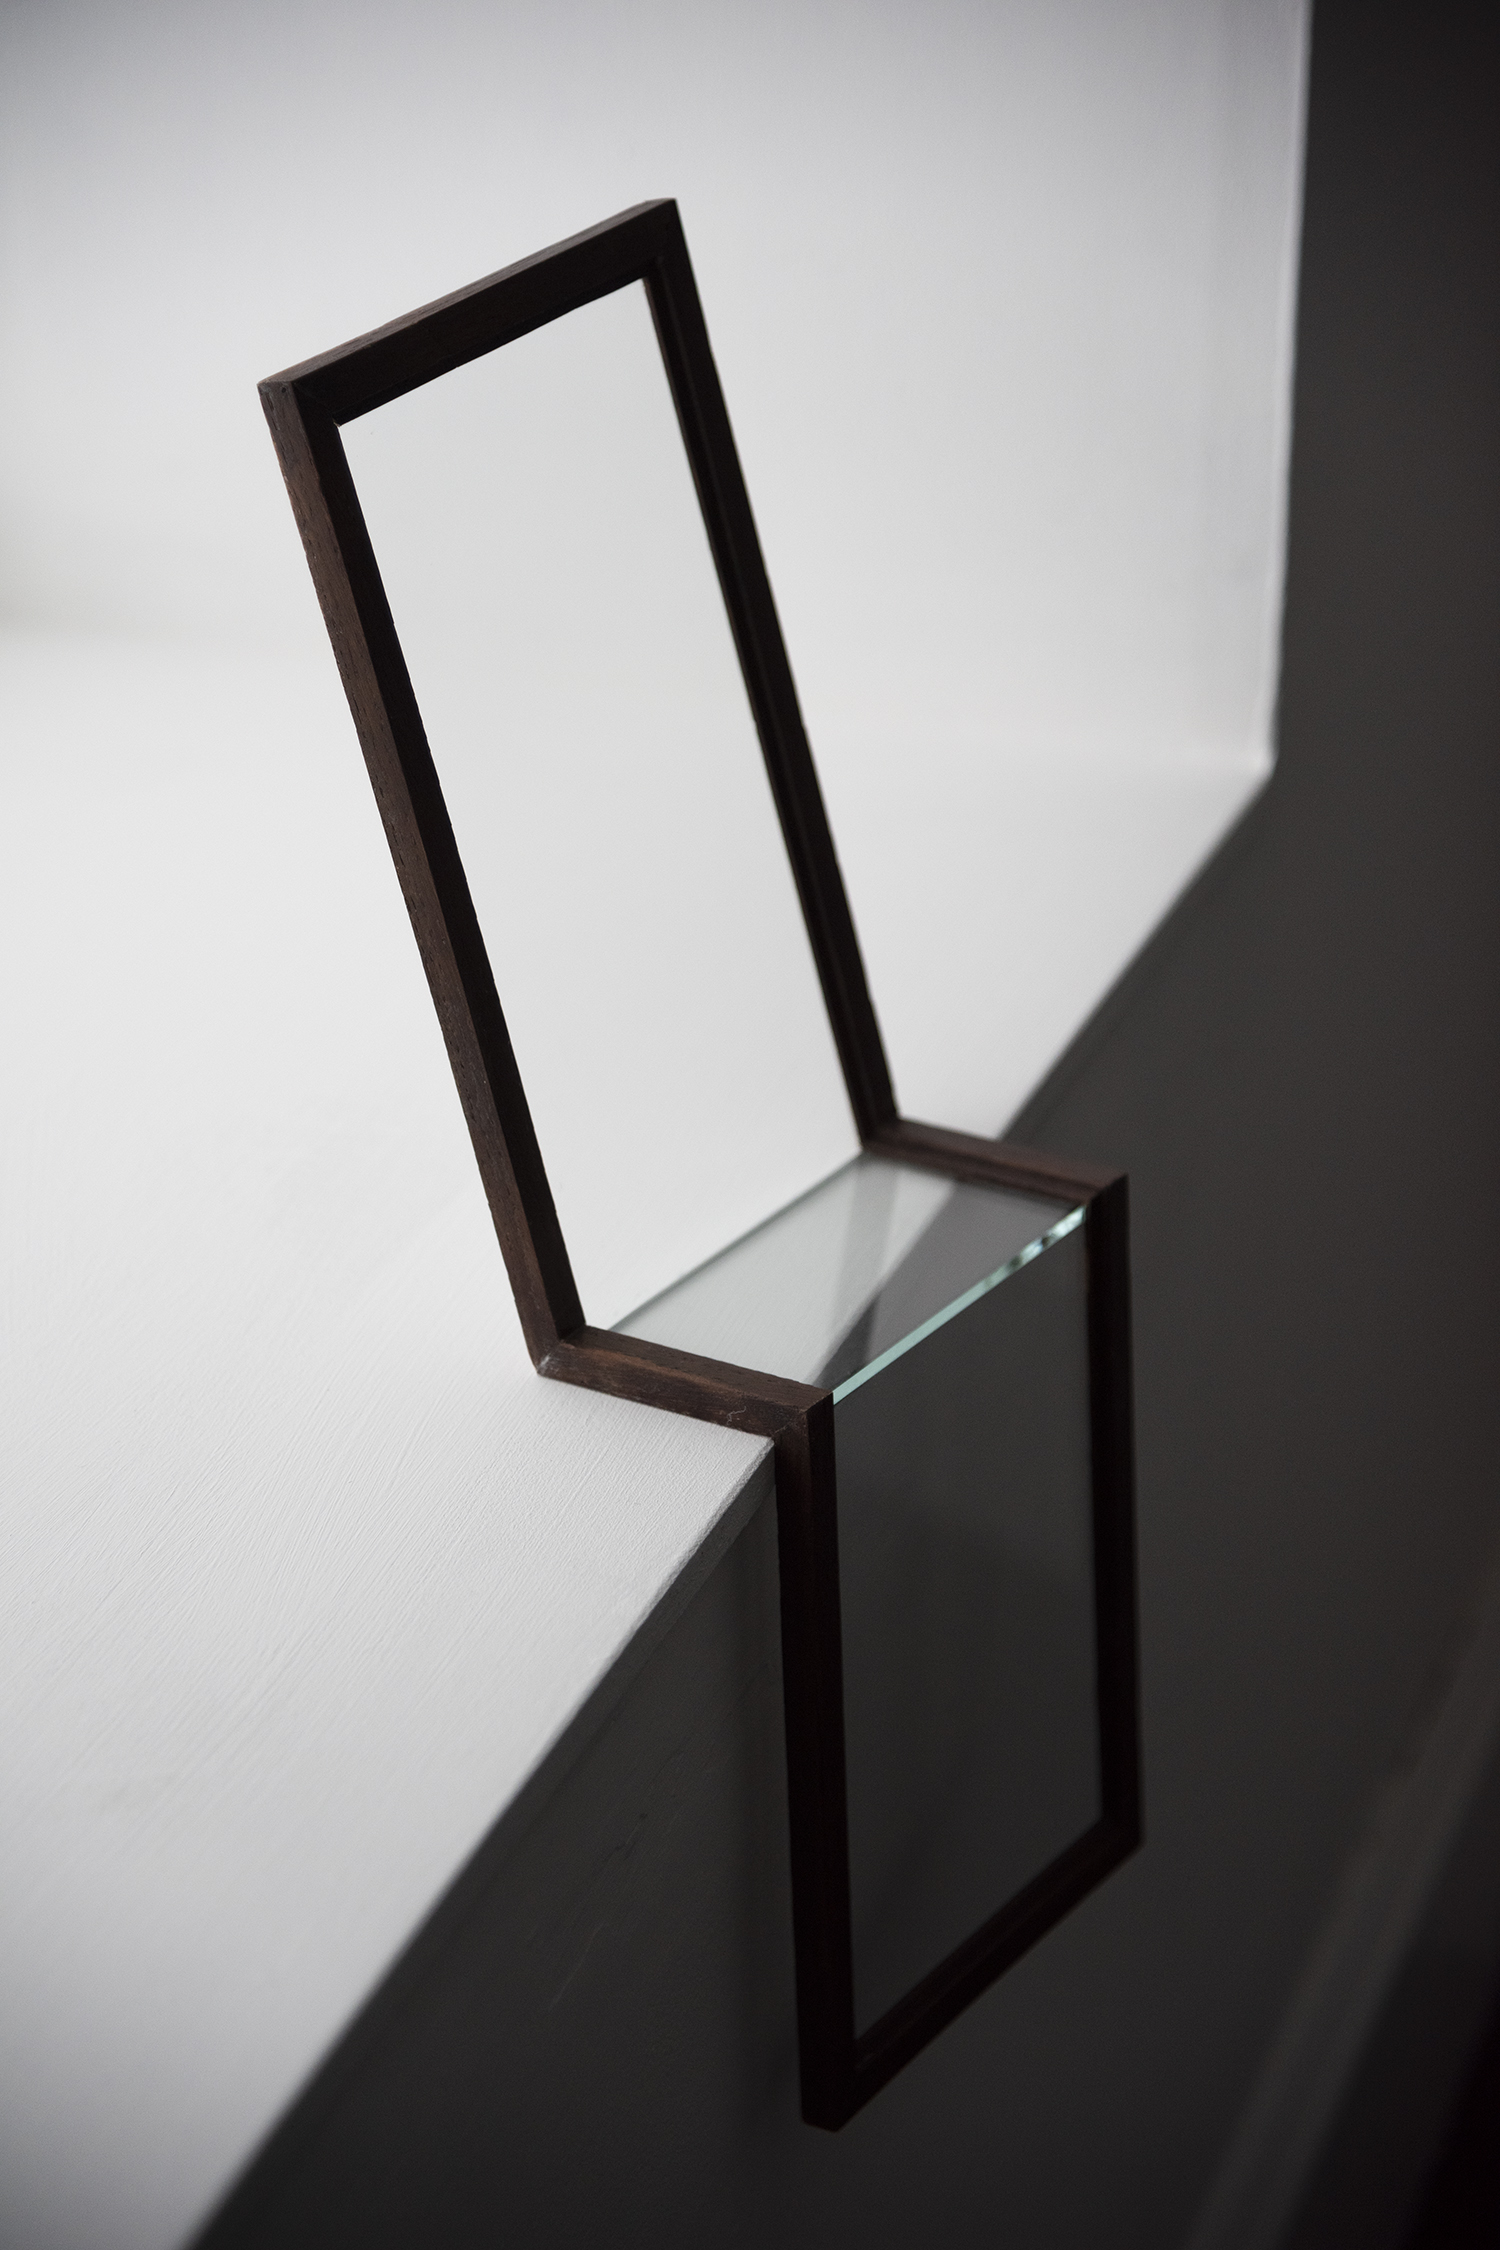 Joseph Calleja Frame Series